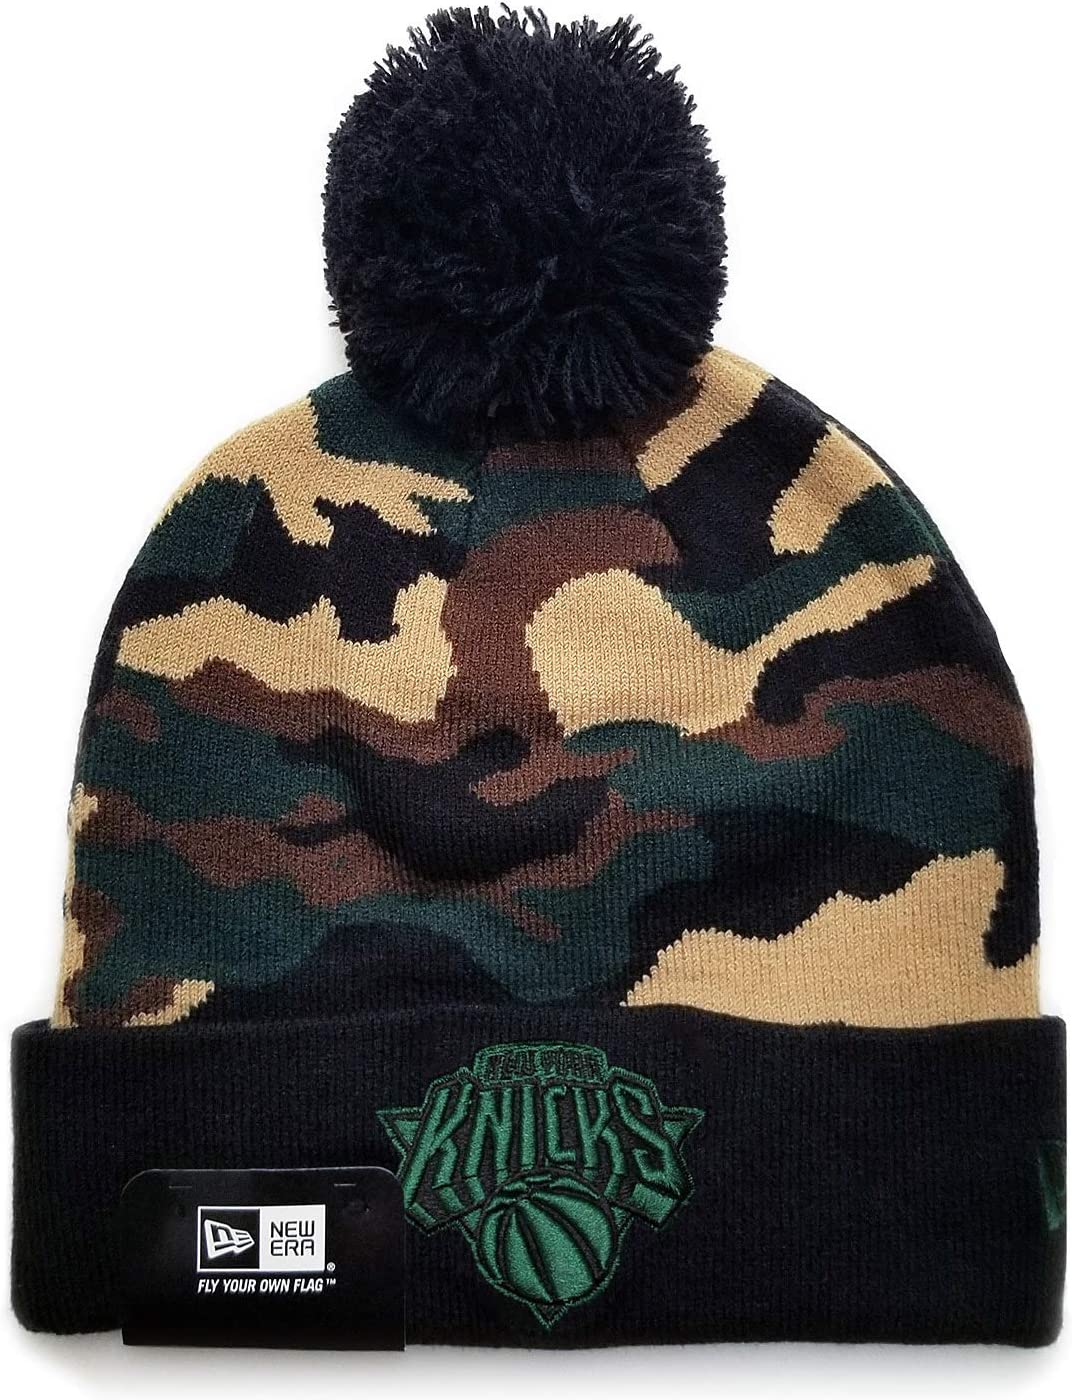 New Era NBA NY New York Knicks Camo Cam Pom Top Stretch Knit Beanie Black Hat